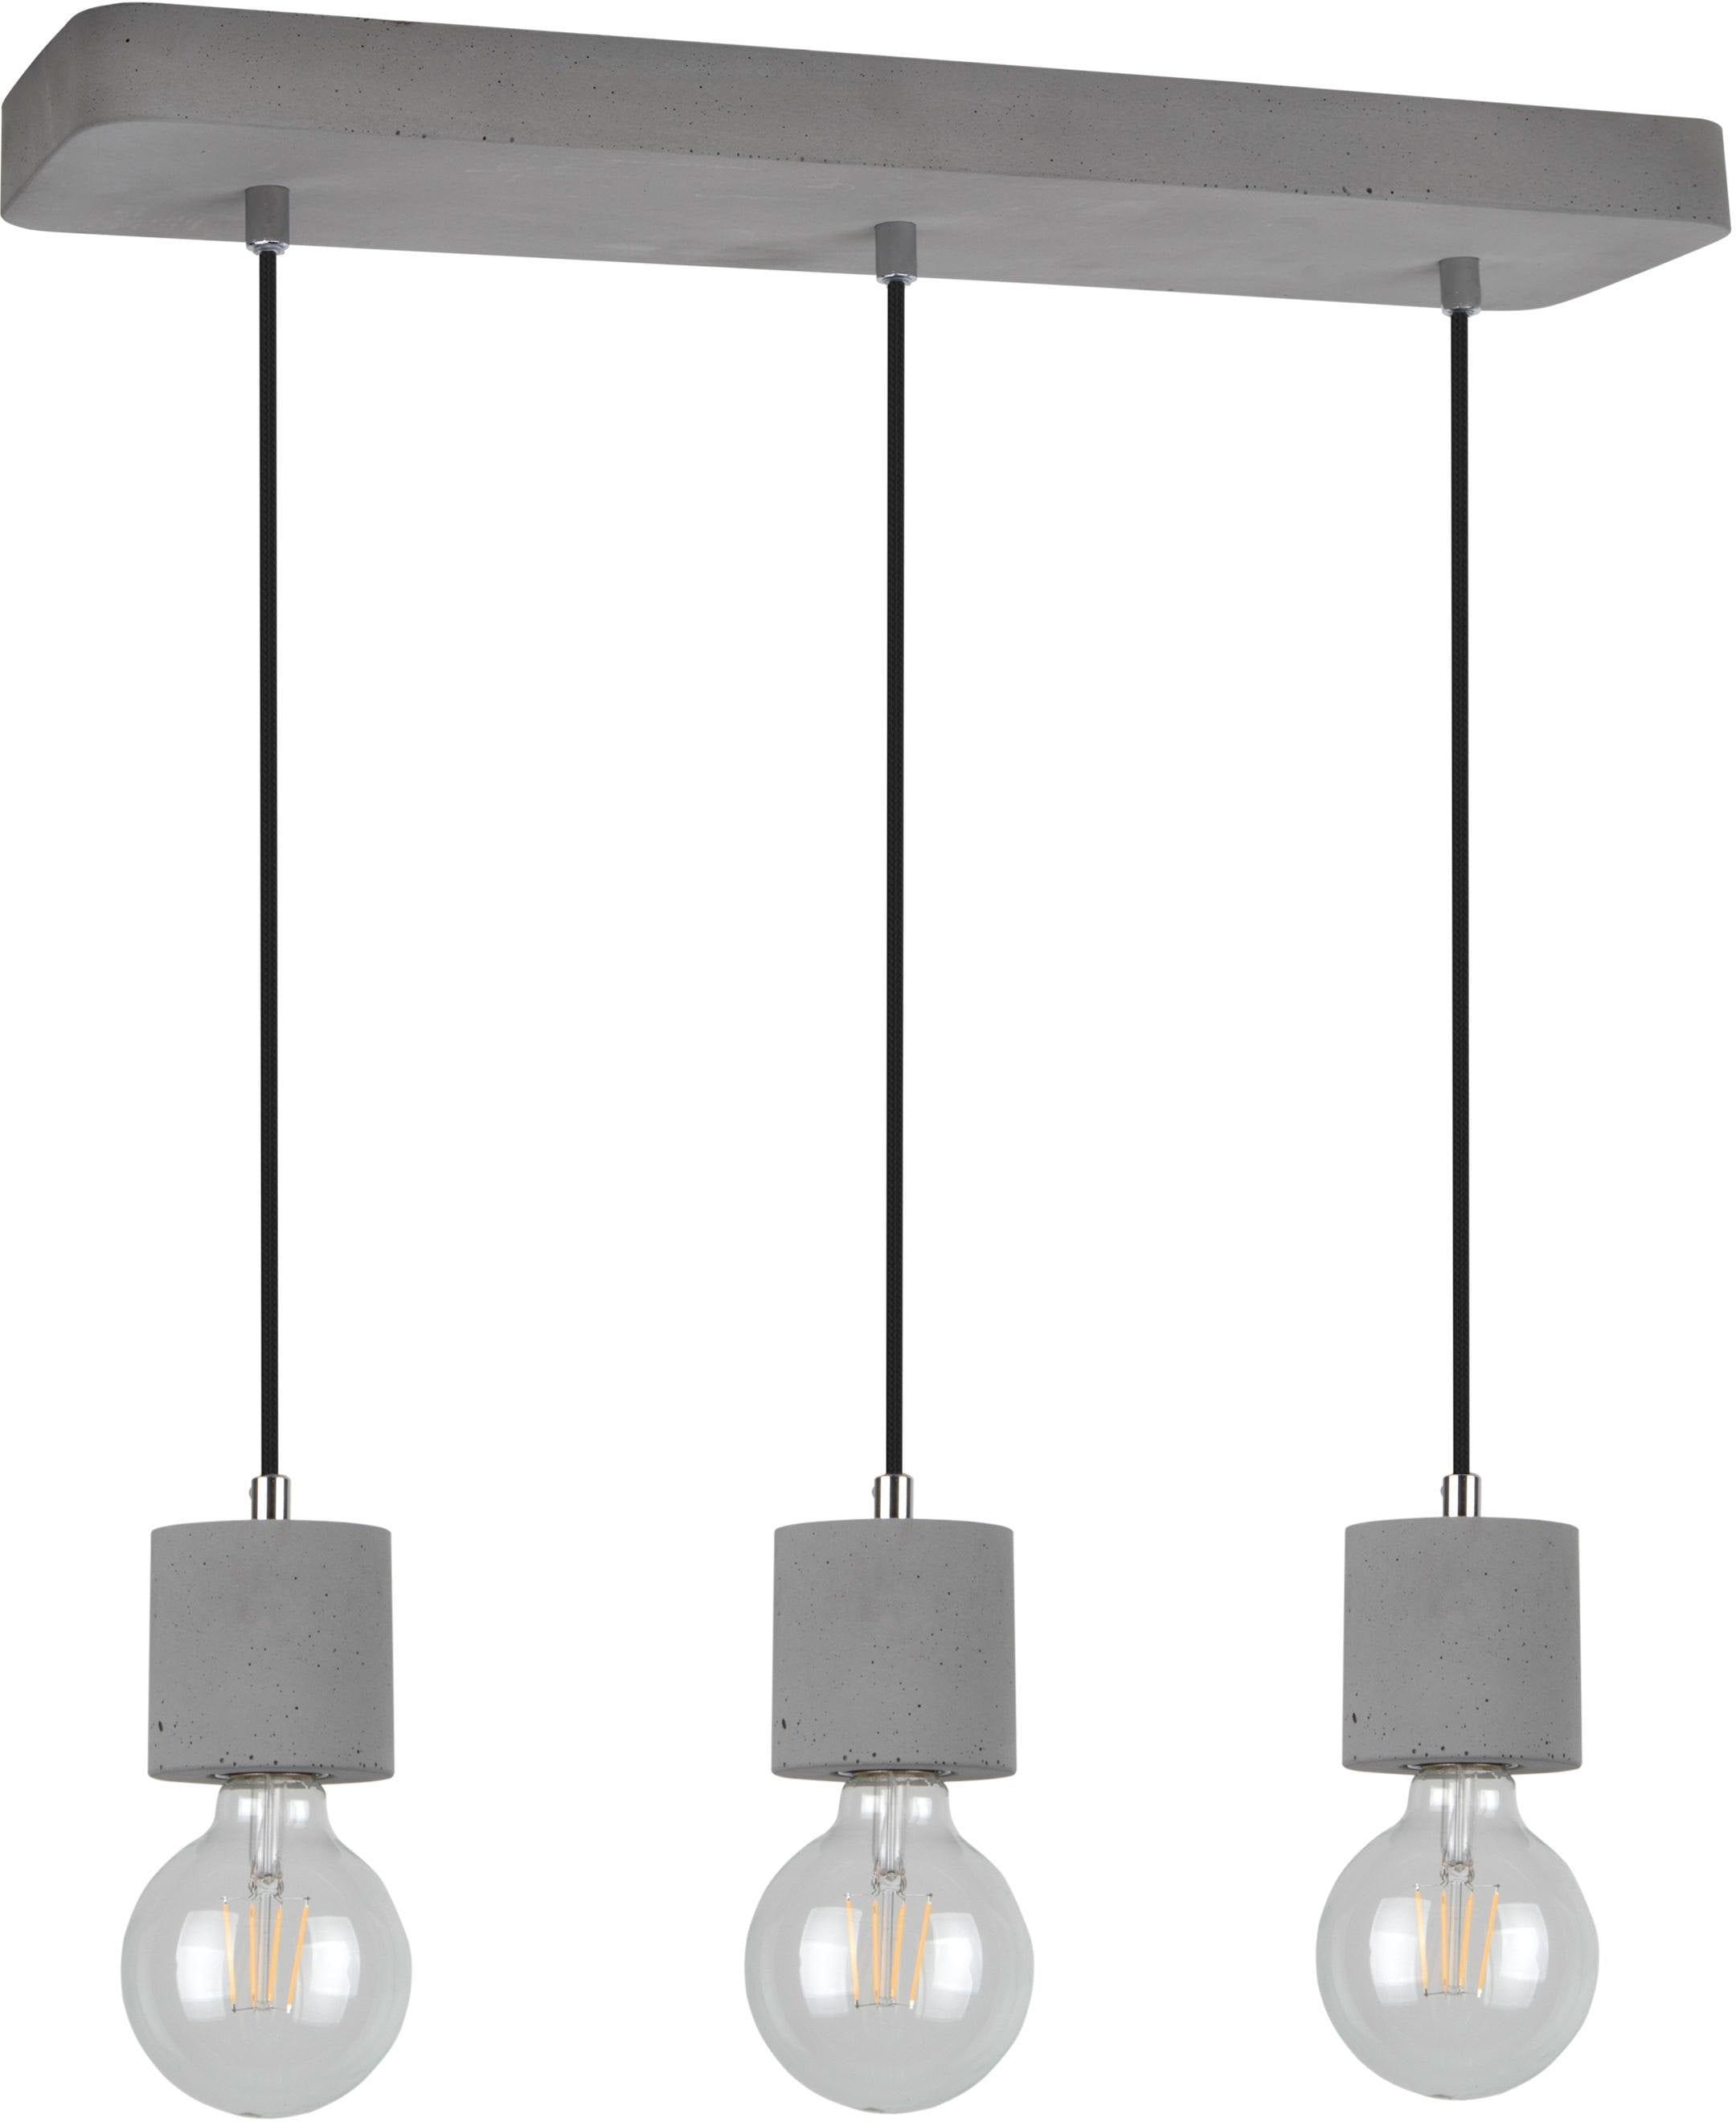 SPOT Light Pendelleuchte STRONG, E27, Hängeleuchte, Moderne Leuchte aus echtem Beton, mit Textilkabel, Kürzbar, Passende LM E27, Made in Europe